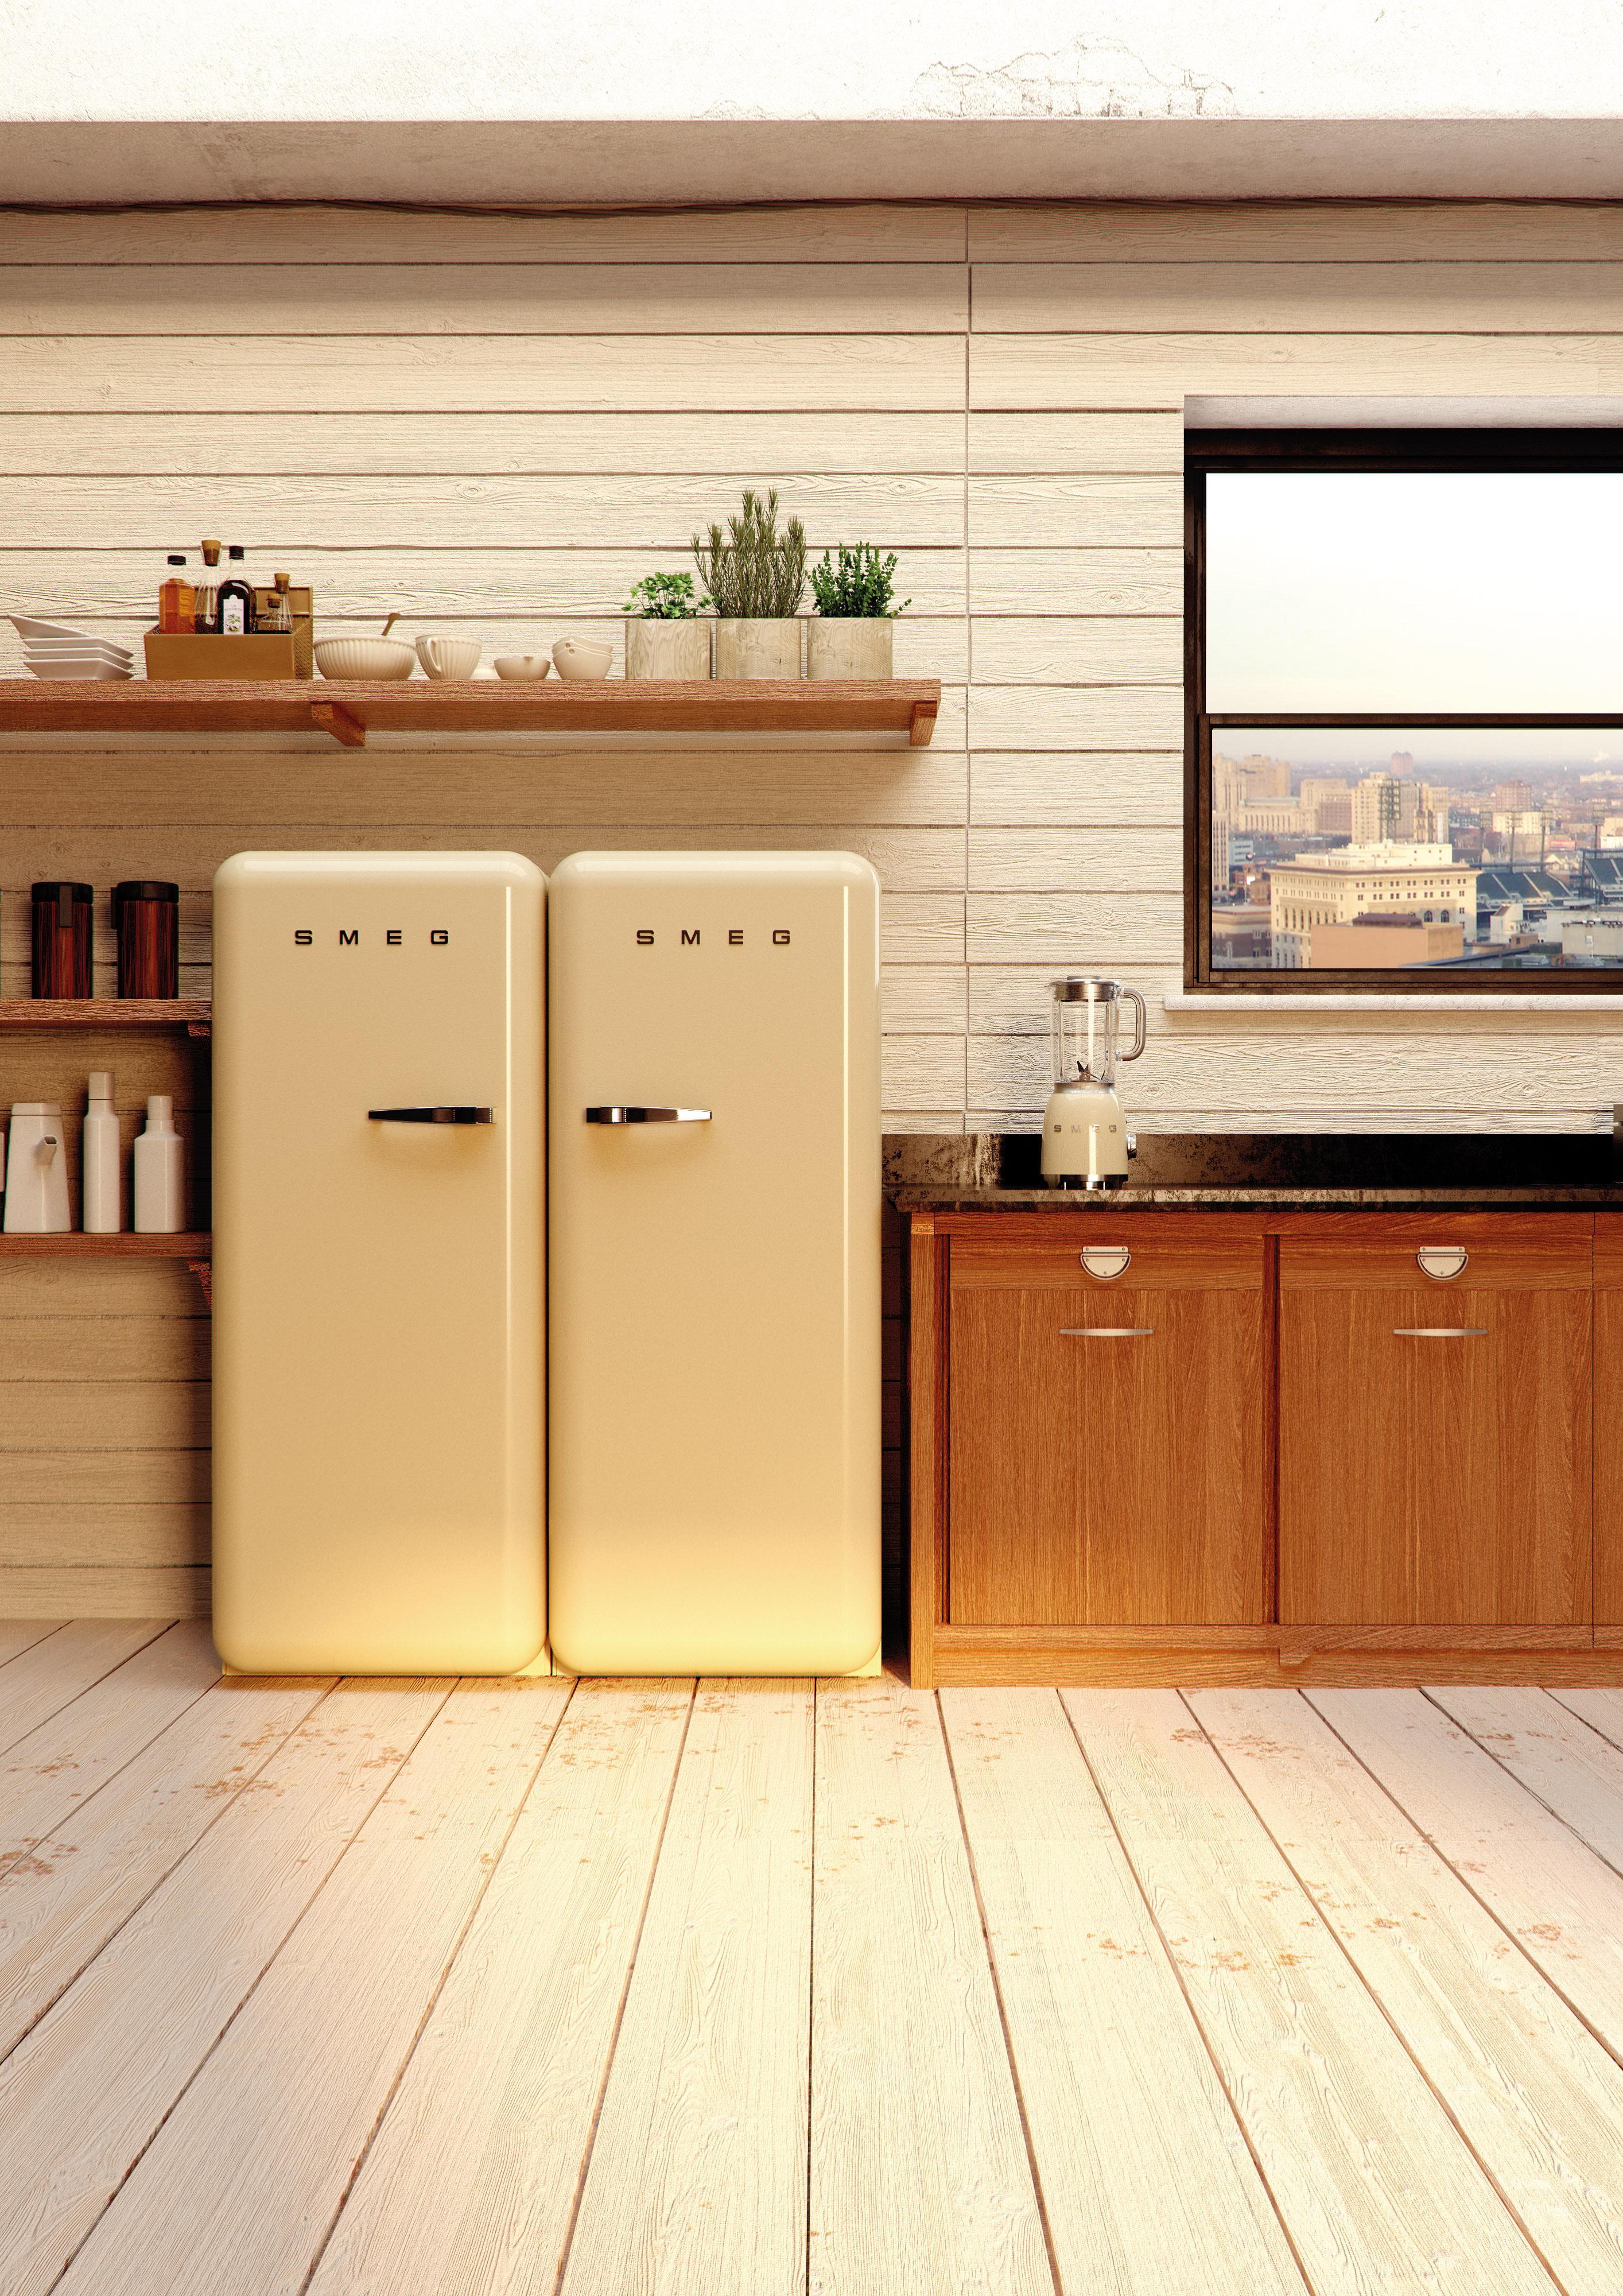 Retro Kühlschränke In Heller Küche #retro #kühlschrank #retrokühlschrank © Smeg